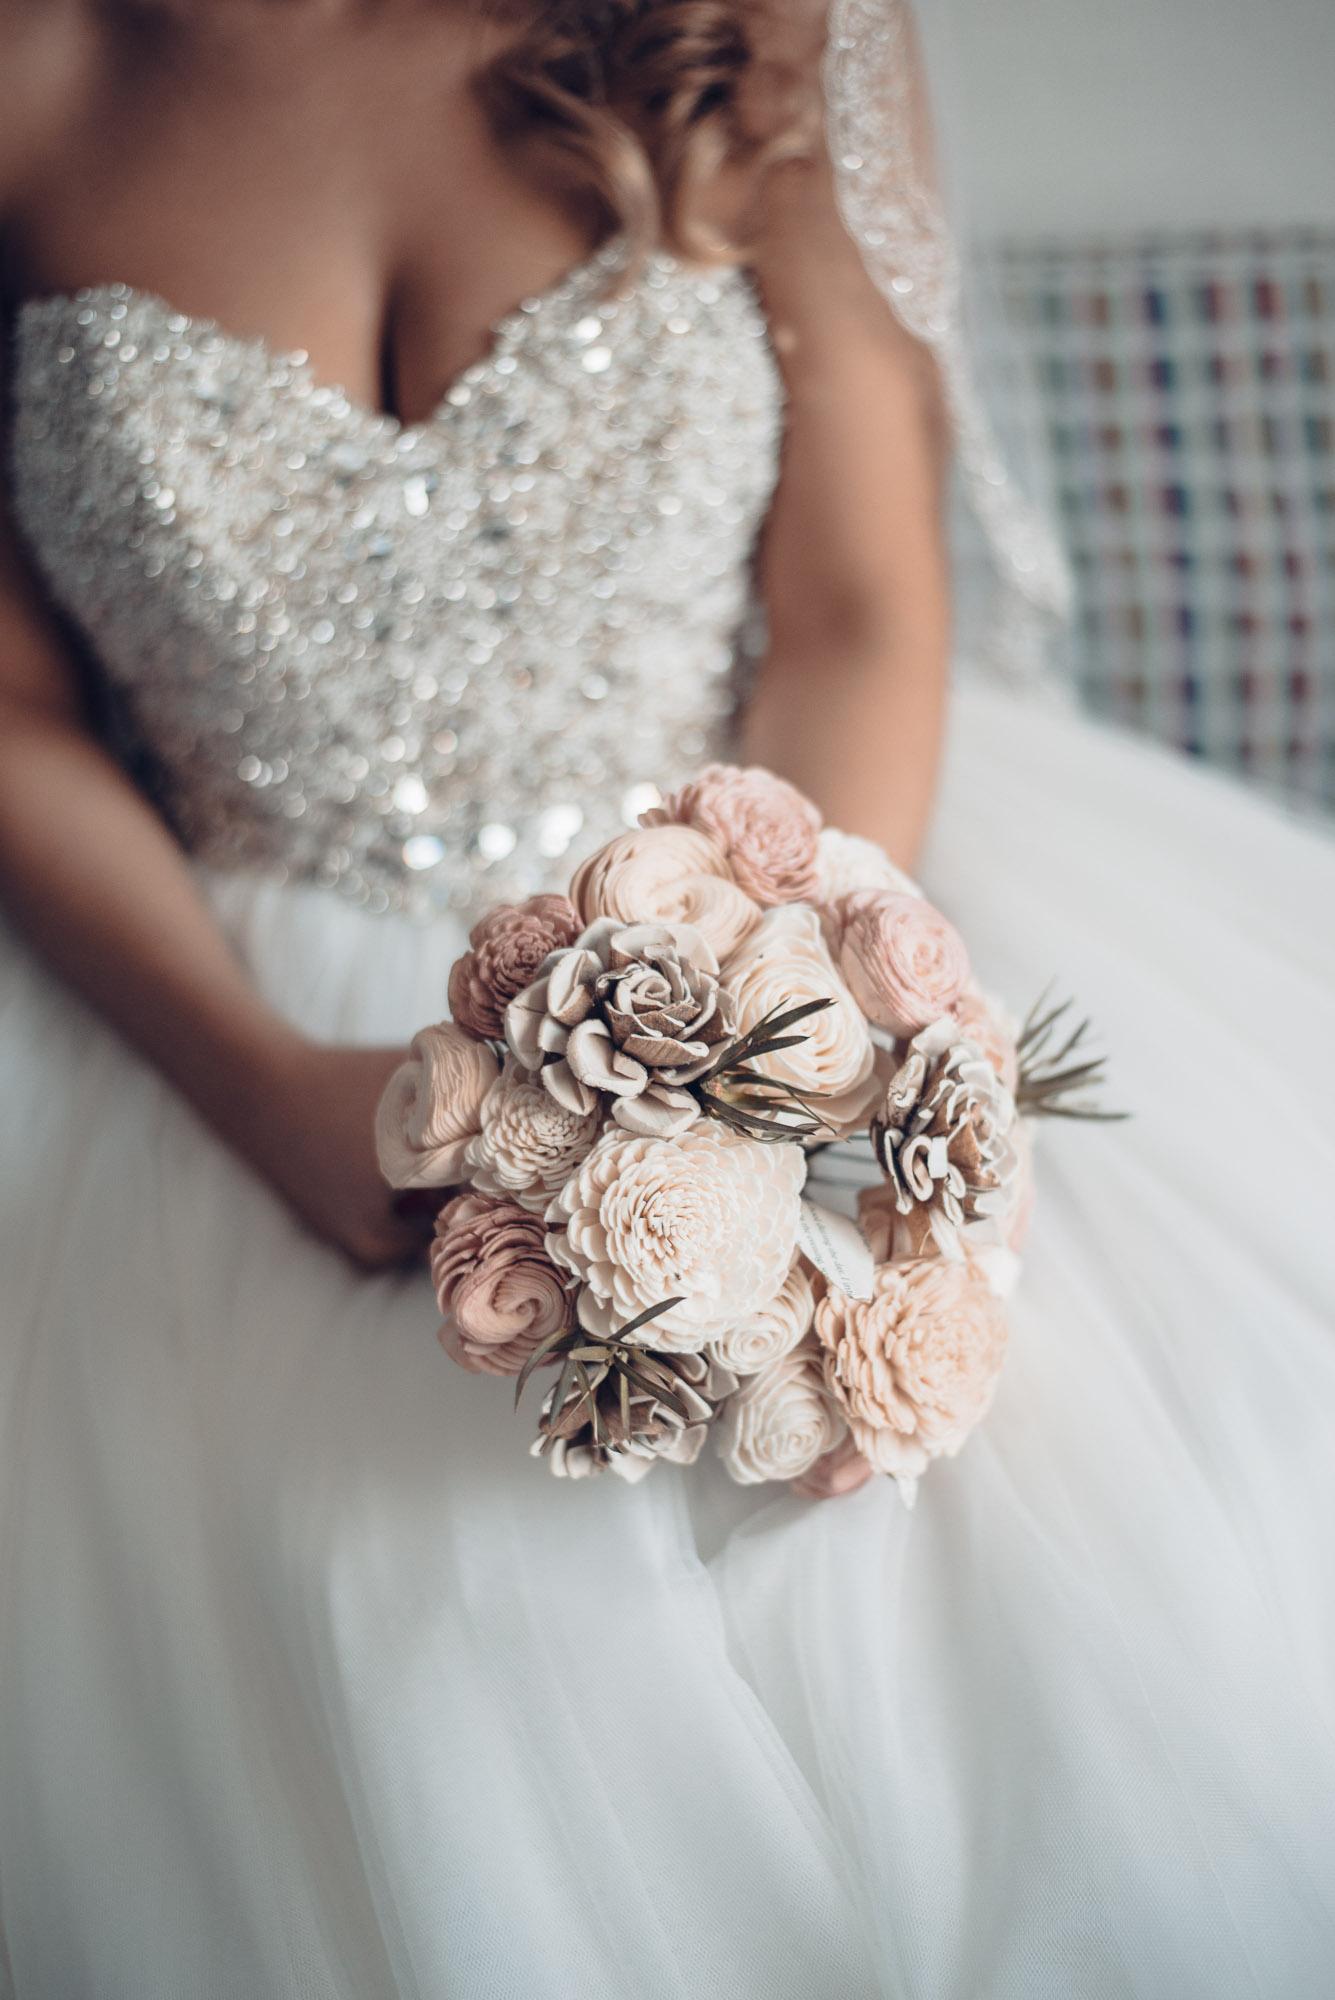 woodwinds_wedding_171020_web-16.jpg